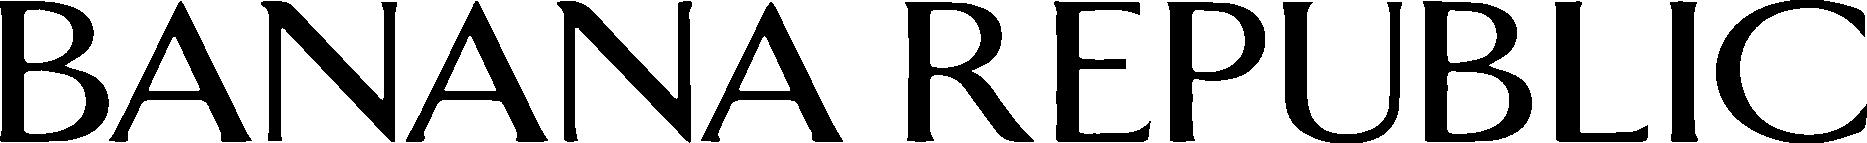 Banana republic logo clipart image stock Banana Republic Logo Vector Icon Template Clipart Free Download image stock